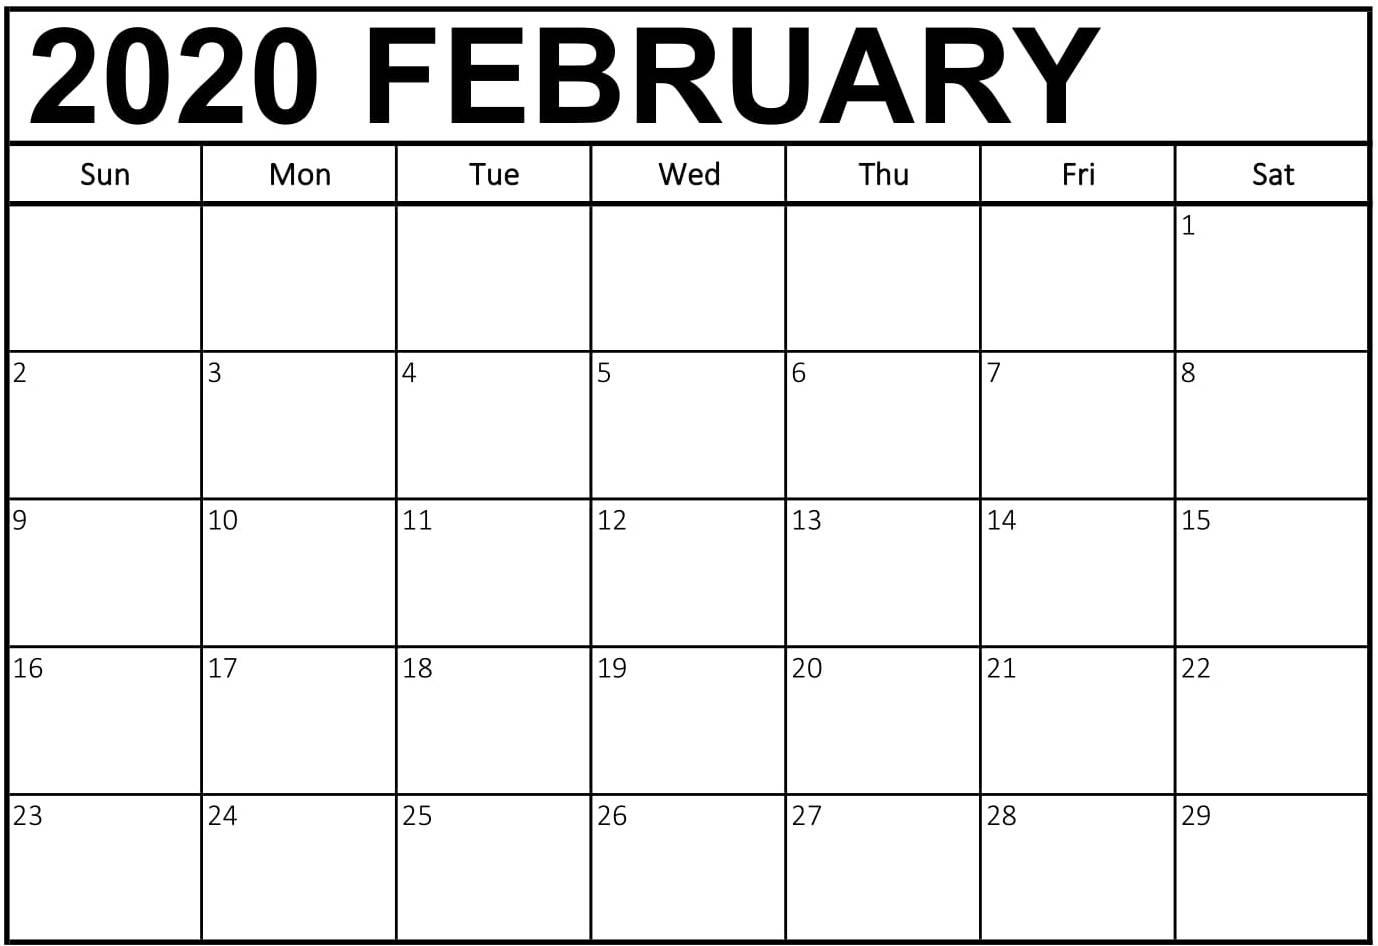 Free February 2020 Calendar Australia Holidays Printable intended for 2020 Calendar Australian